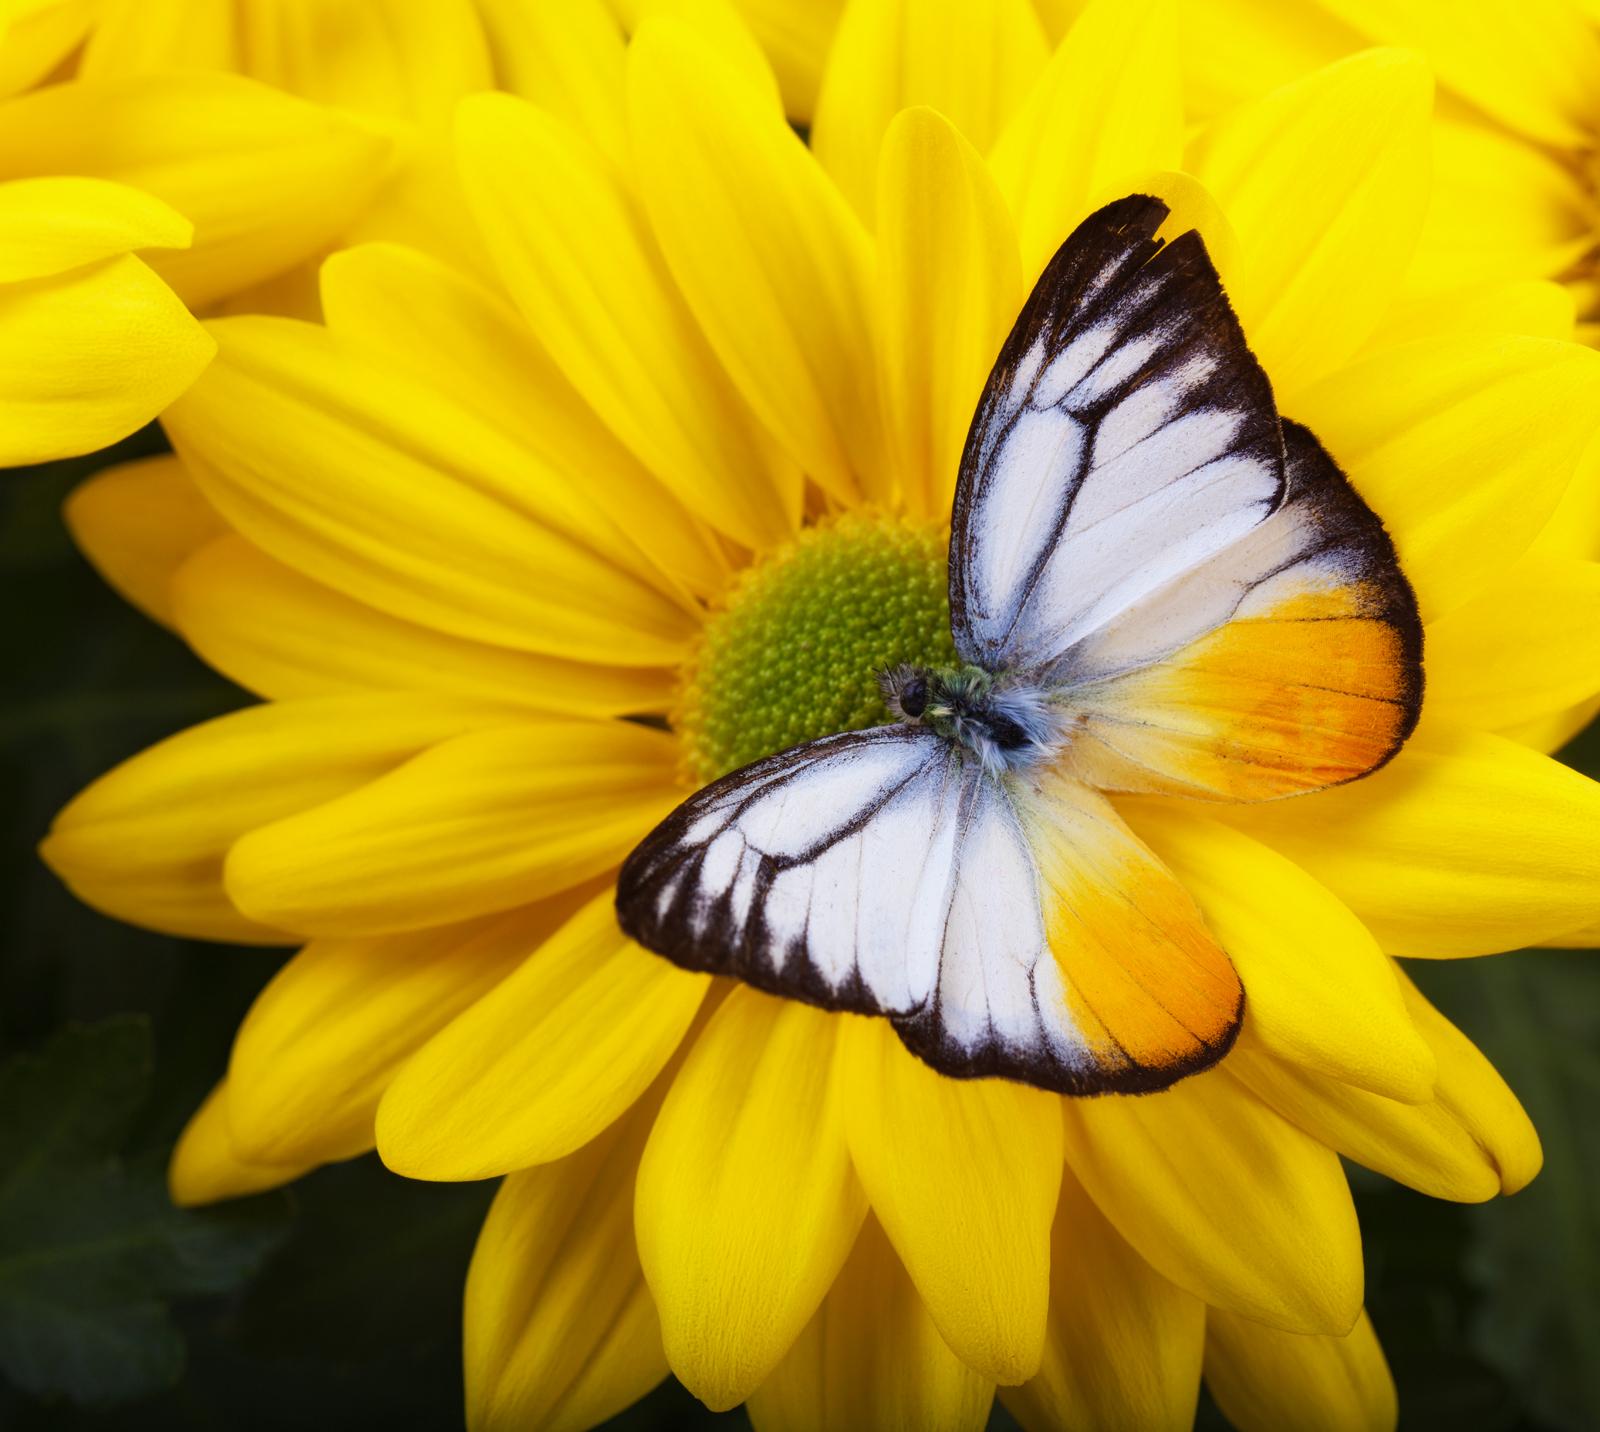 Lesser Gull Butterfly on Yellow Chrysanthemum